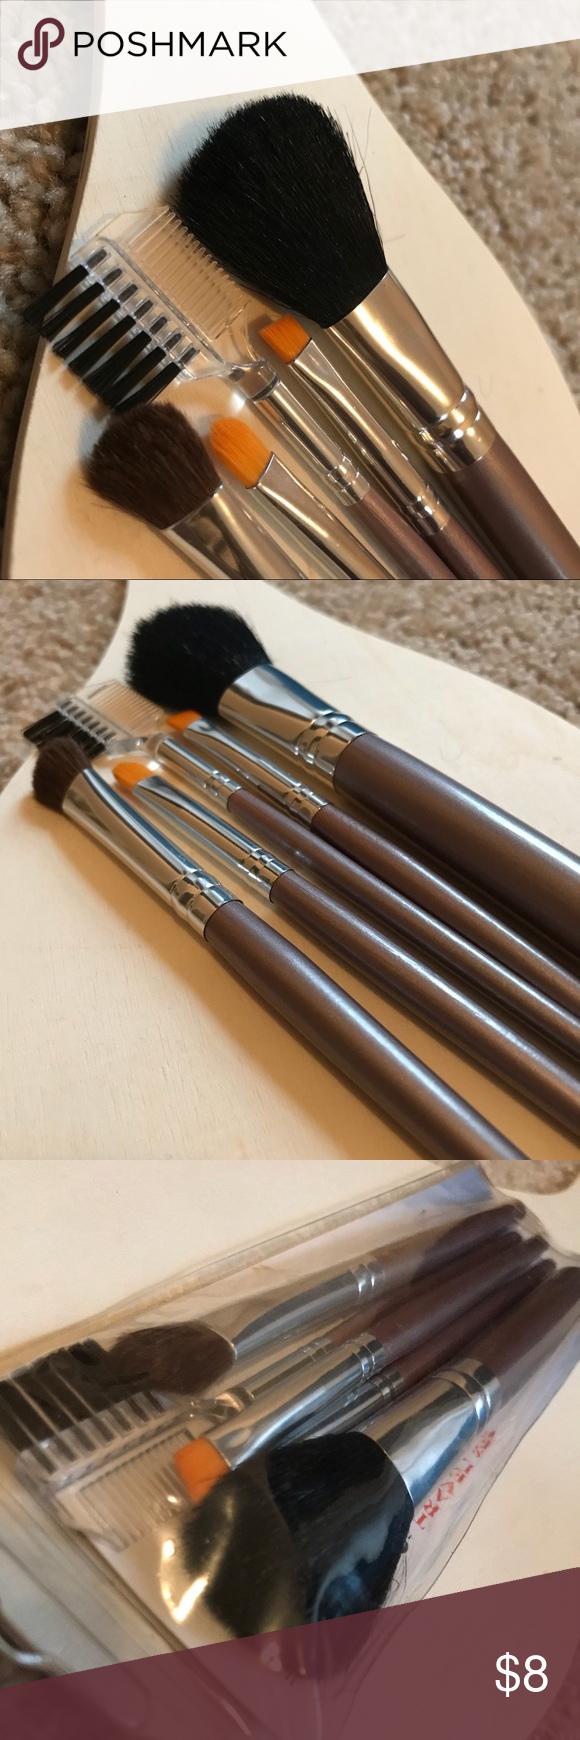 CRUELTY FREE OnTheGo Travel Makeup Brush Set! Brand new